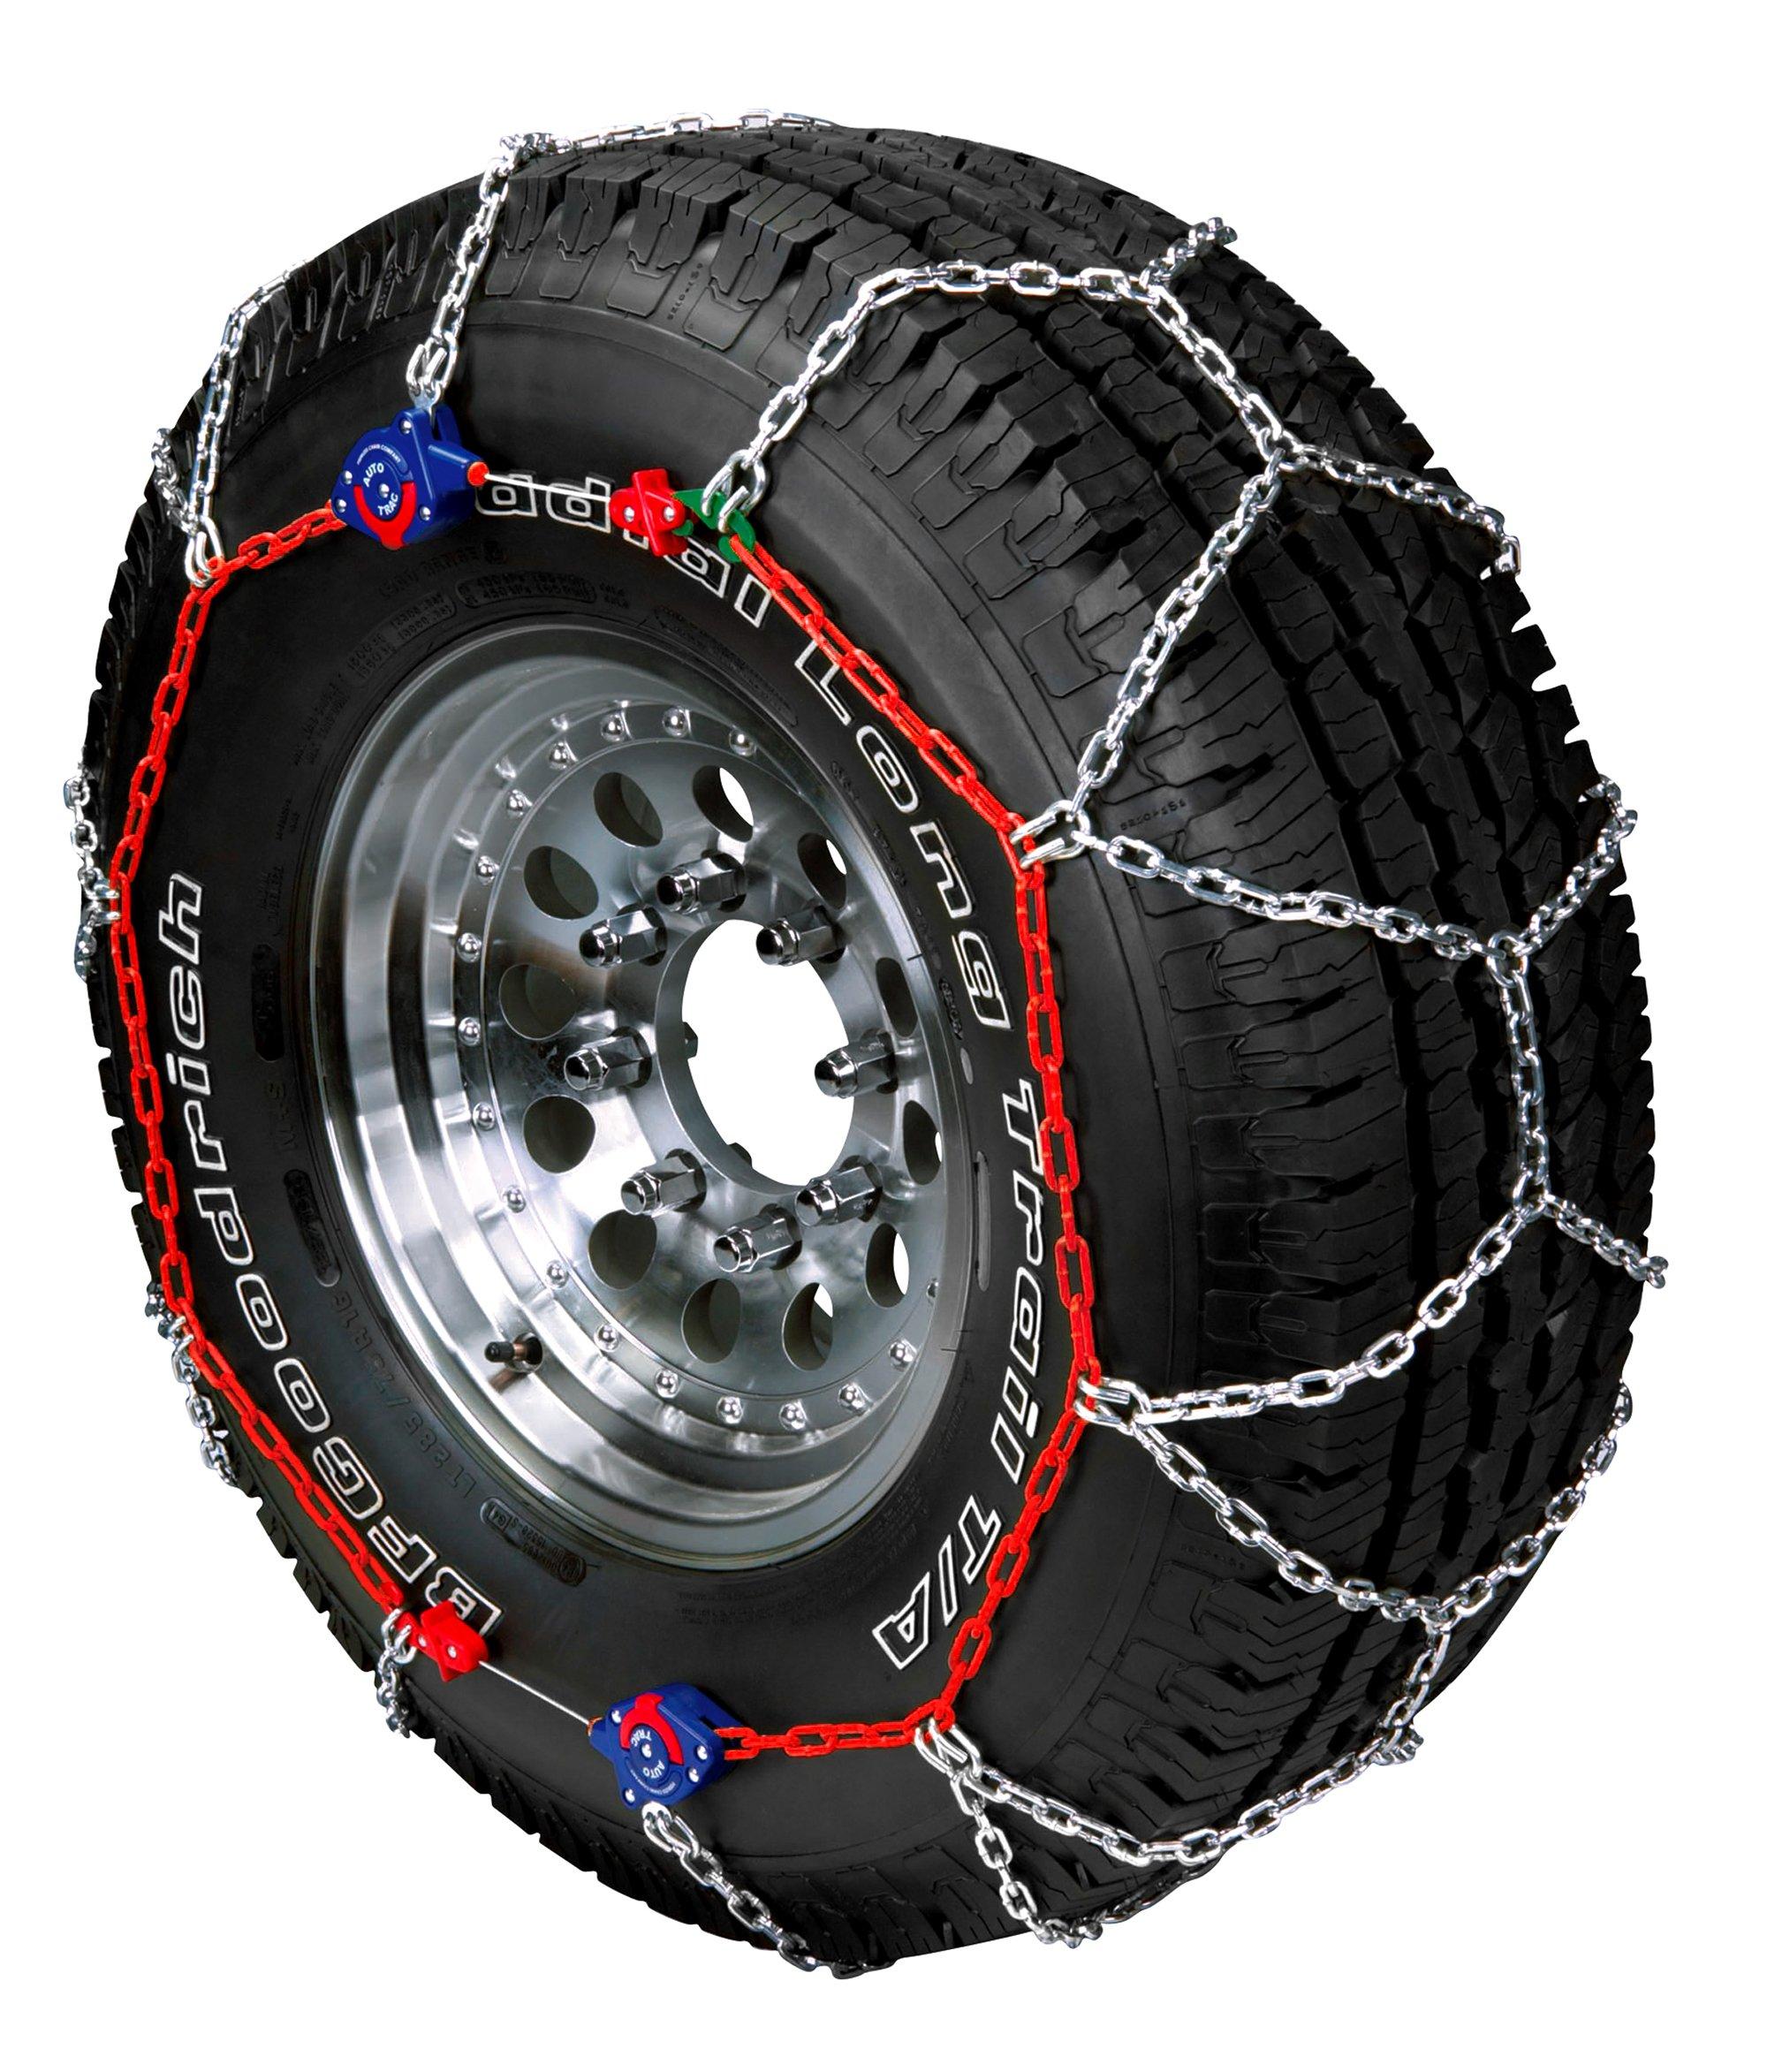 Peerless 0232405 Auto-Trac Light Truck/SUV Tire Traction Chain - Set of 2